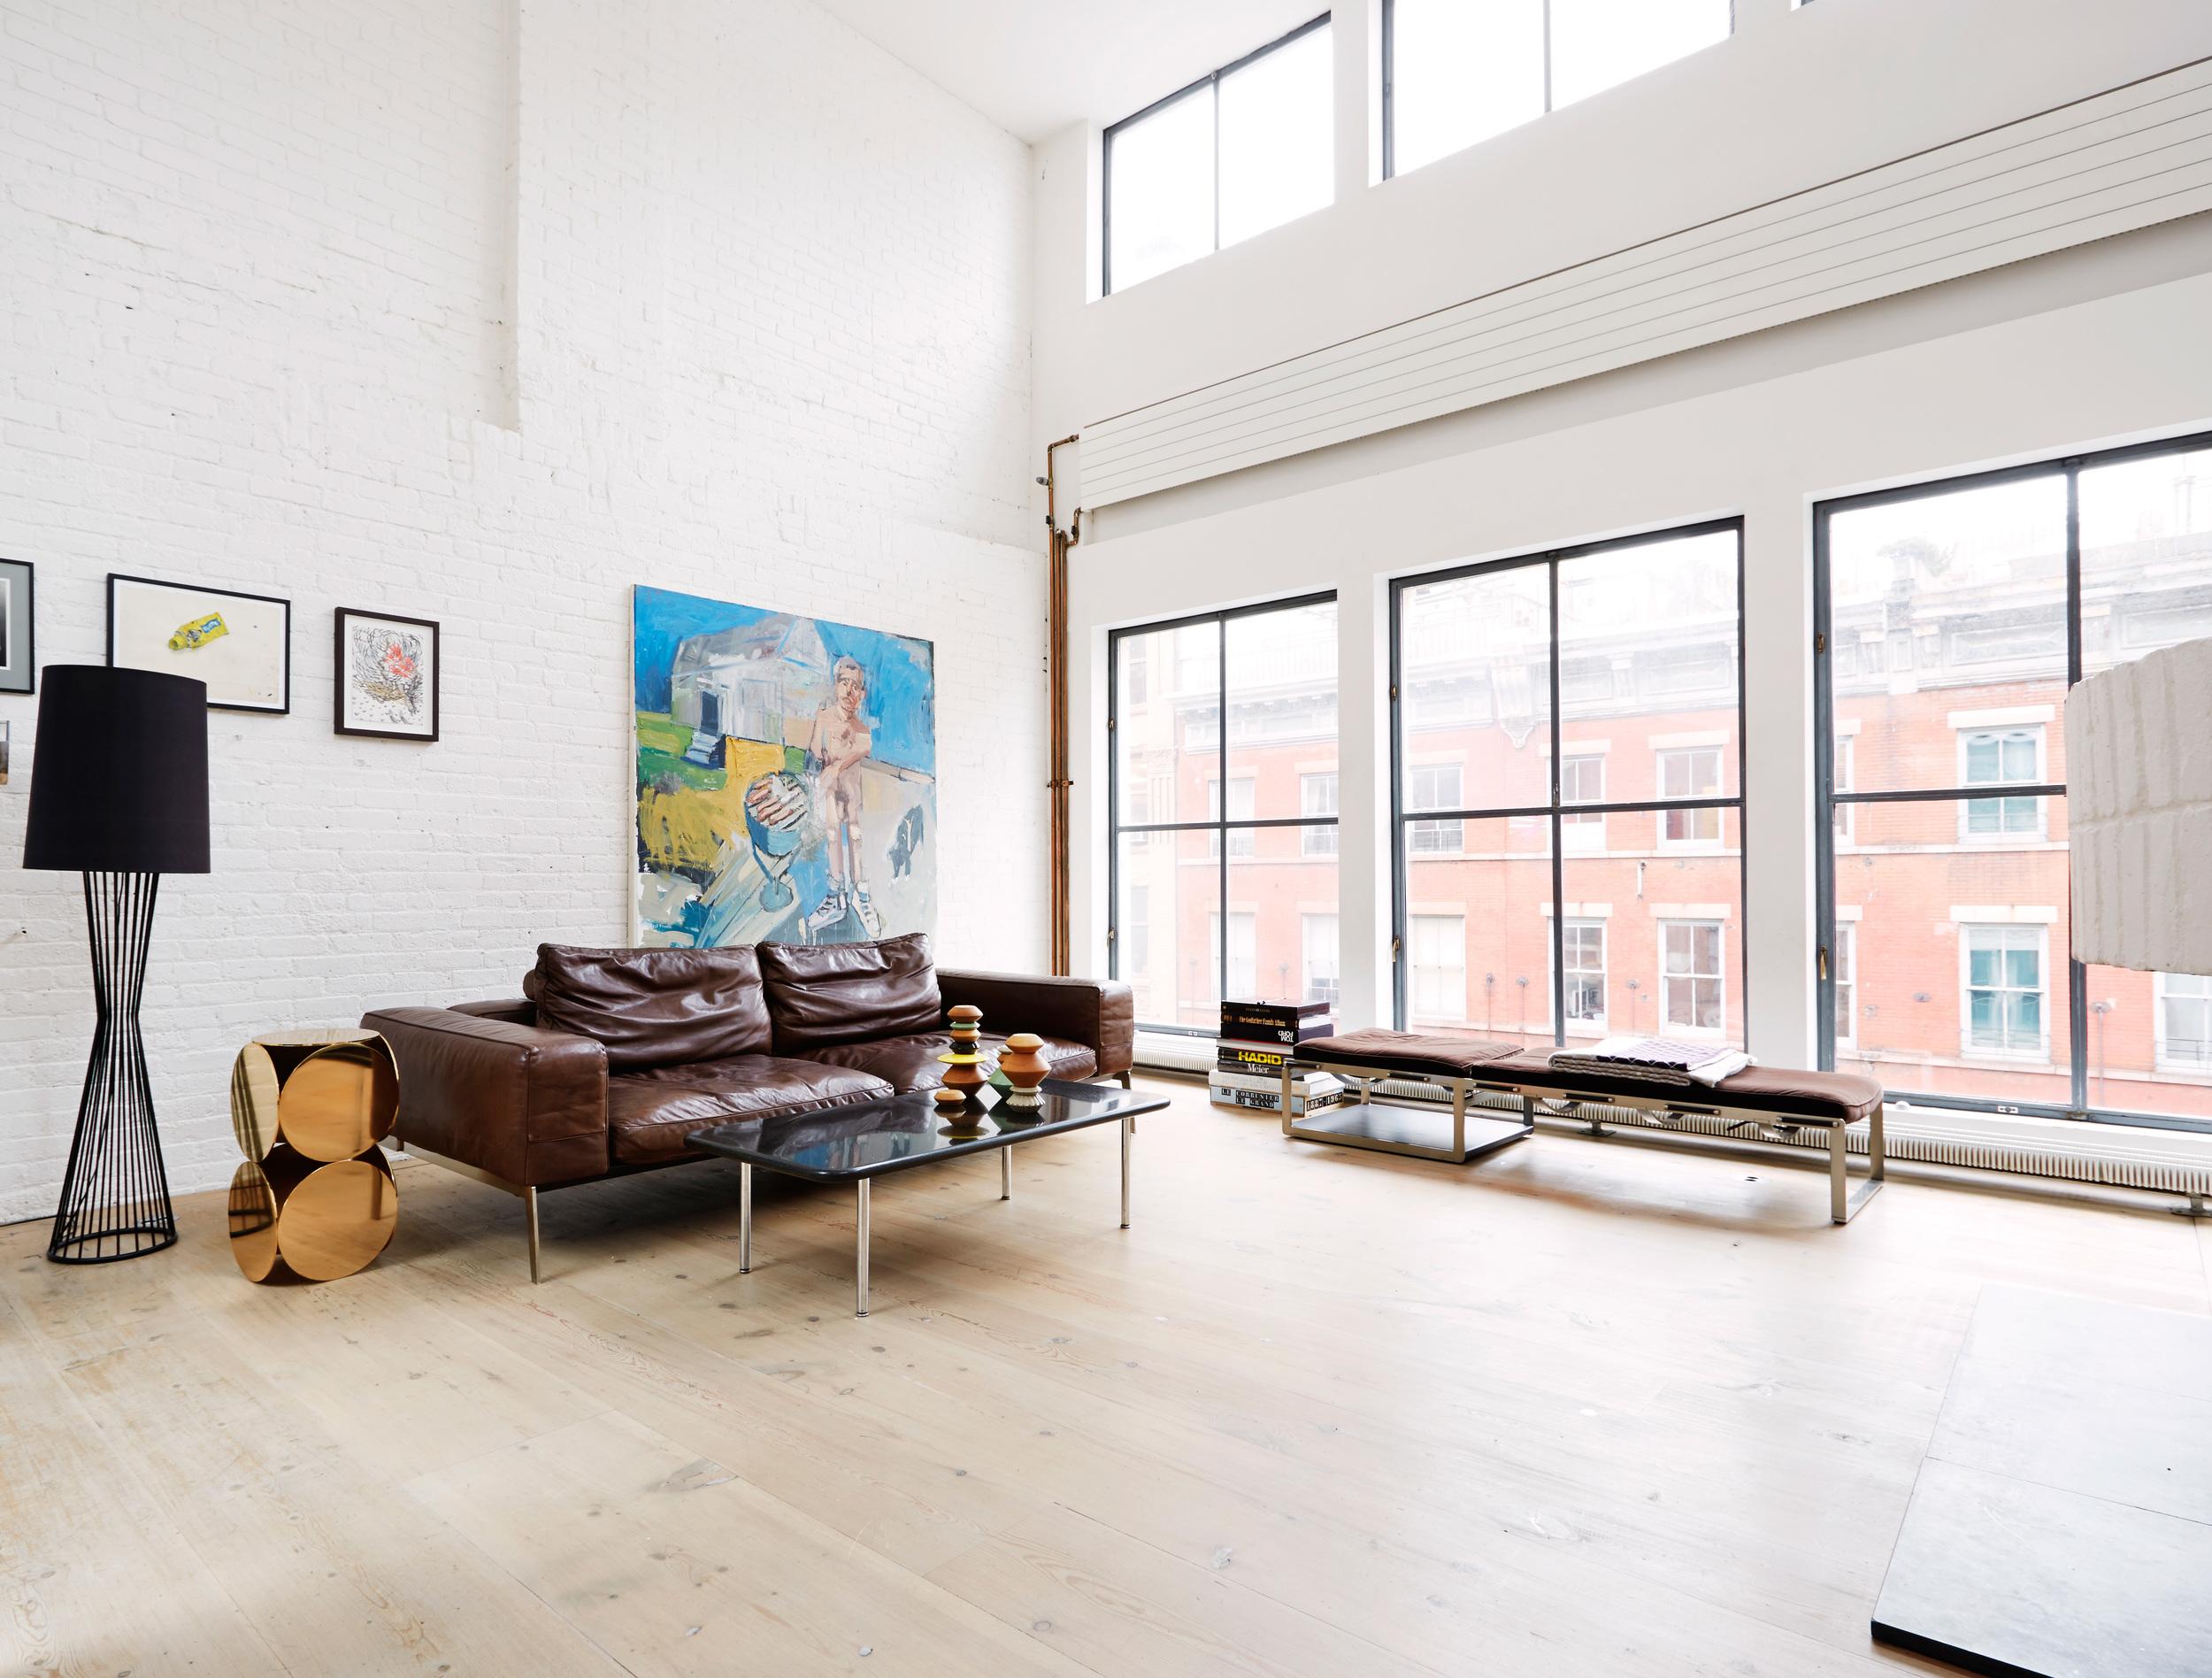 soren rose harrison st 1 Light Mid century Modern in NYC